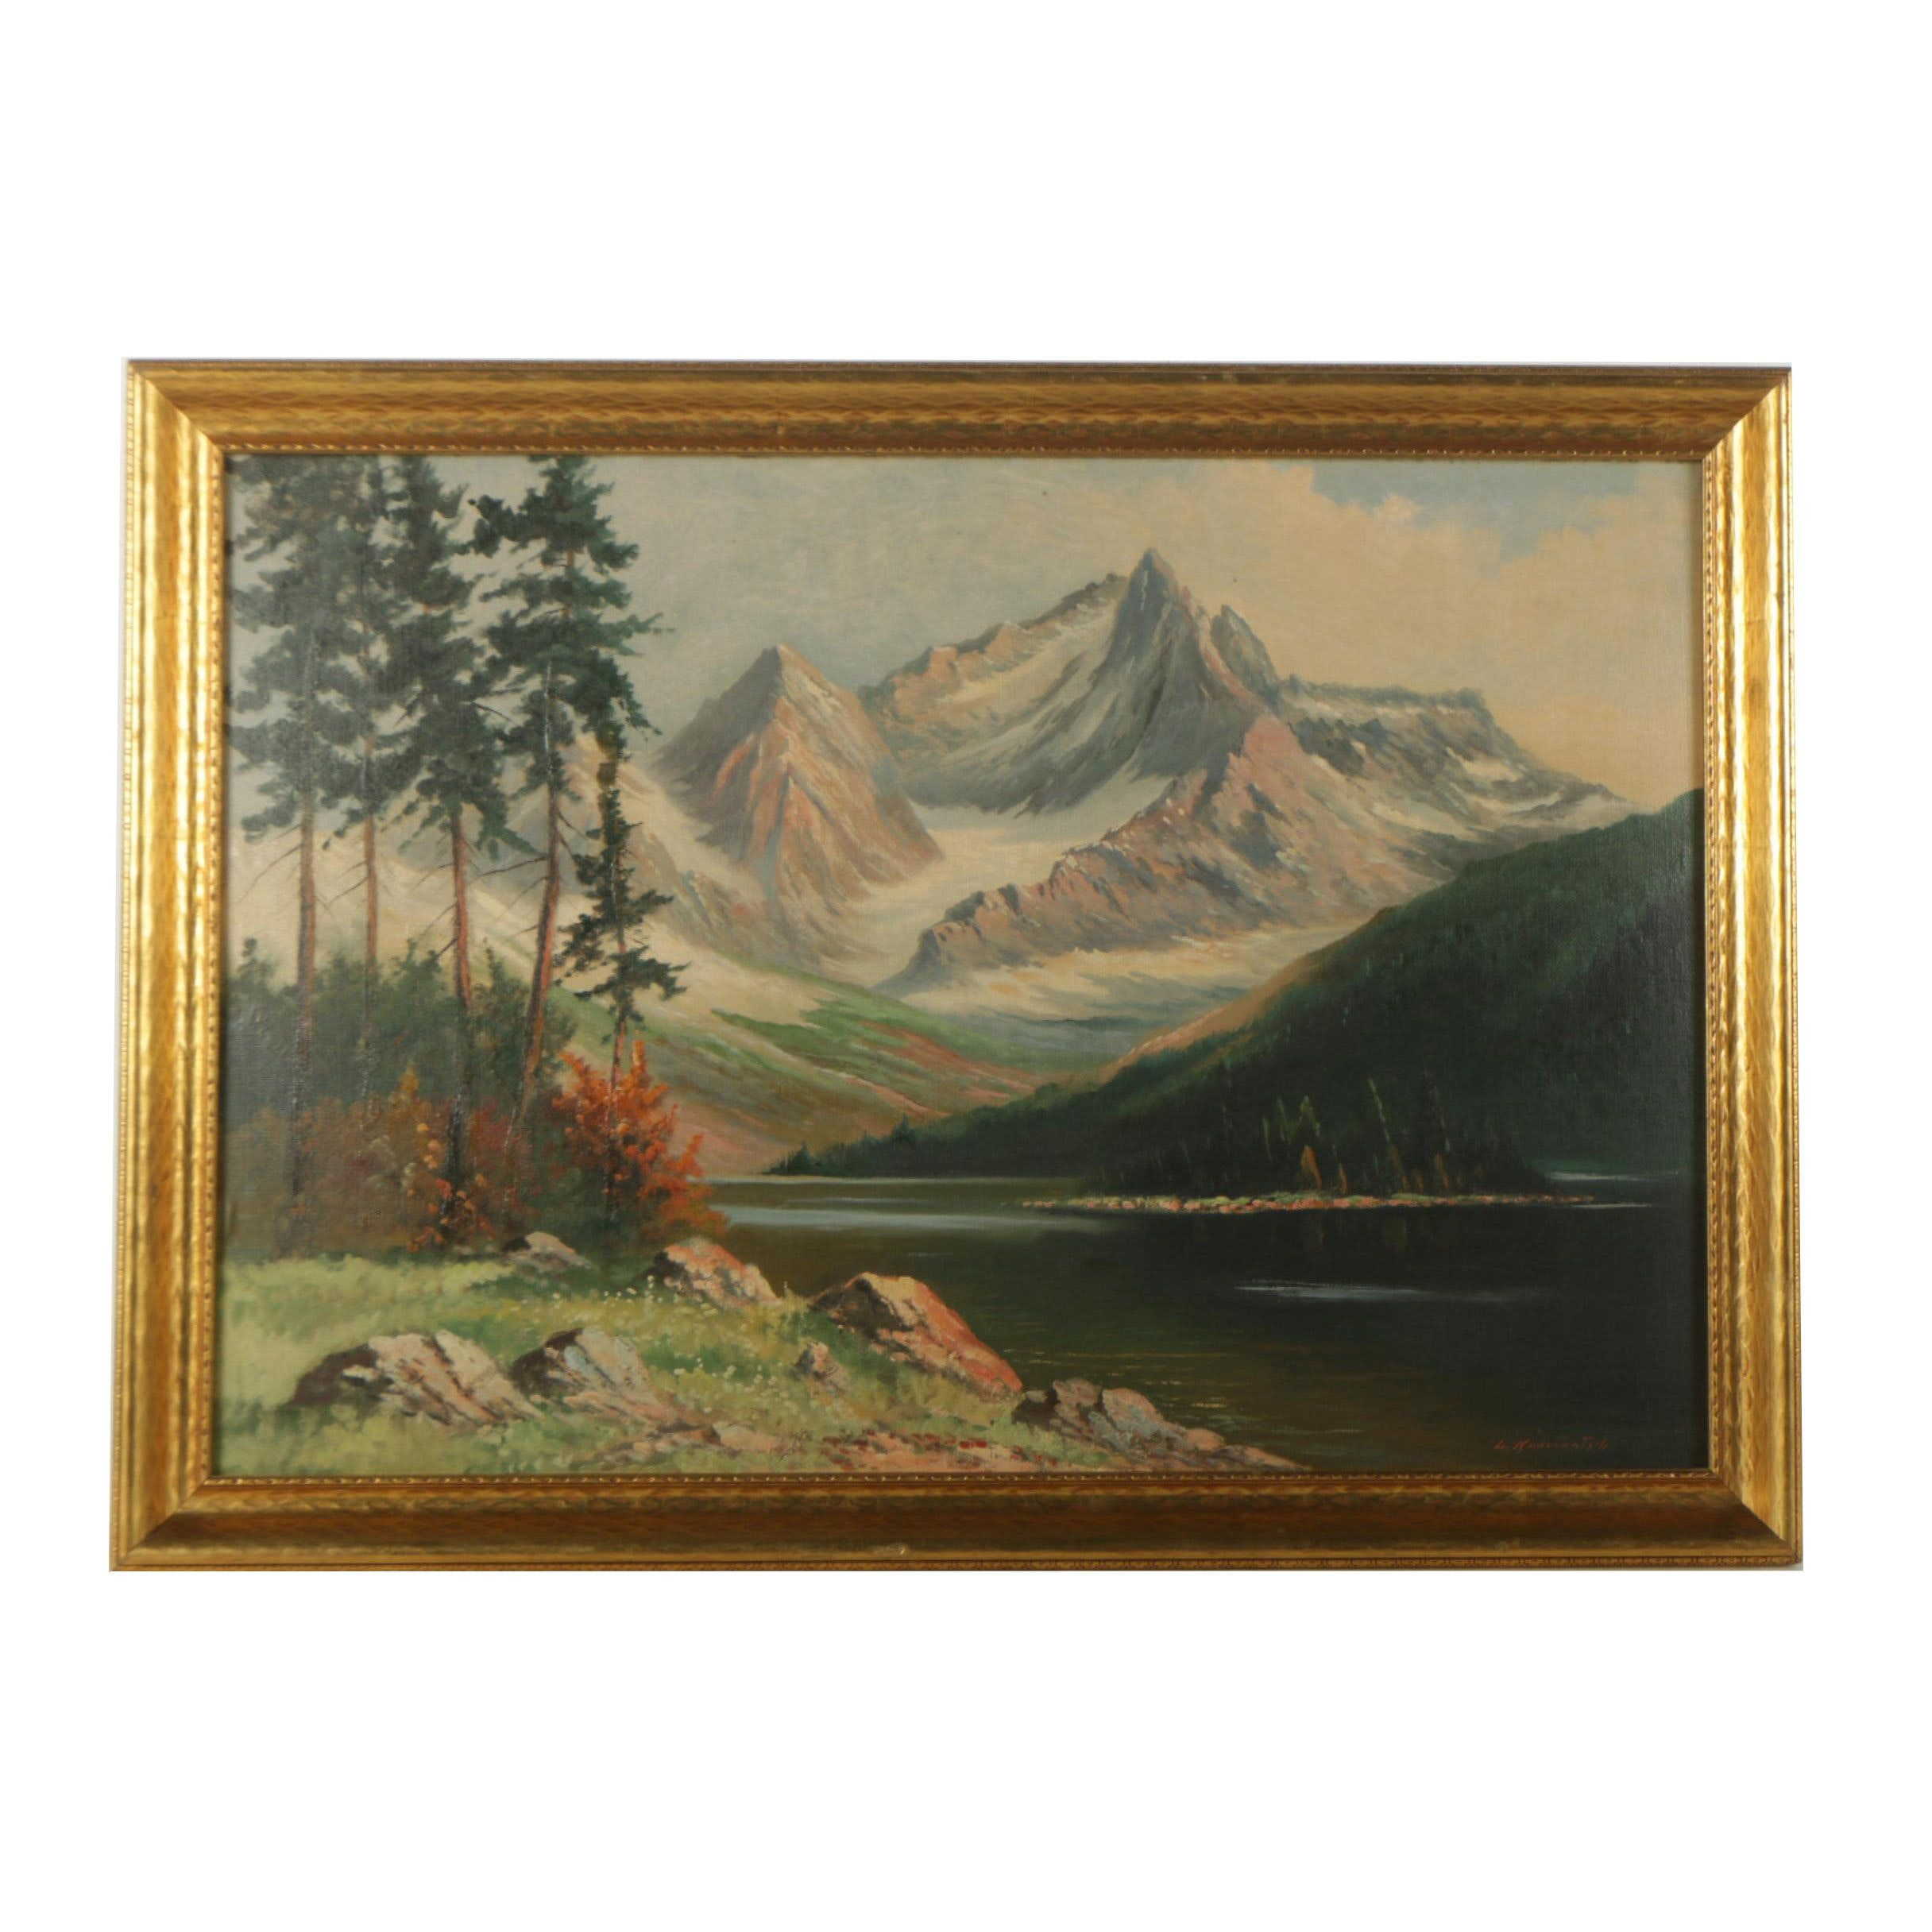 Li. Kudernatgrh Oil Painting on Canvas Mountain Landscape